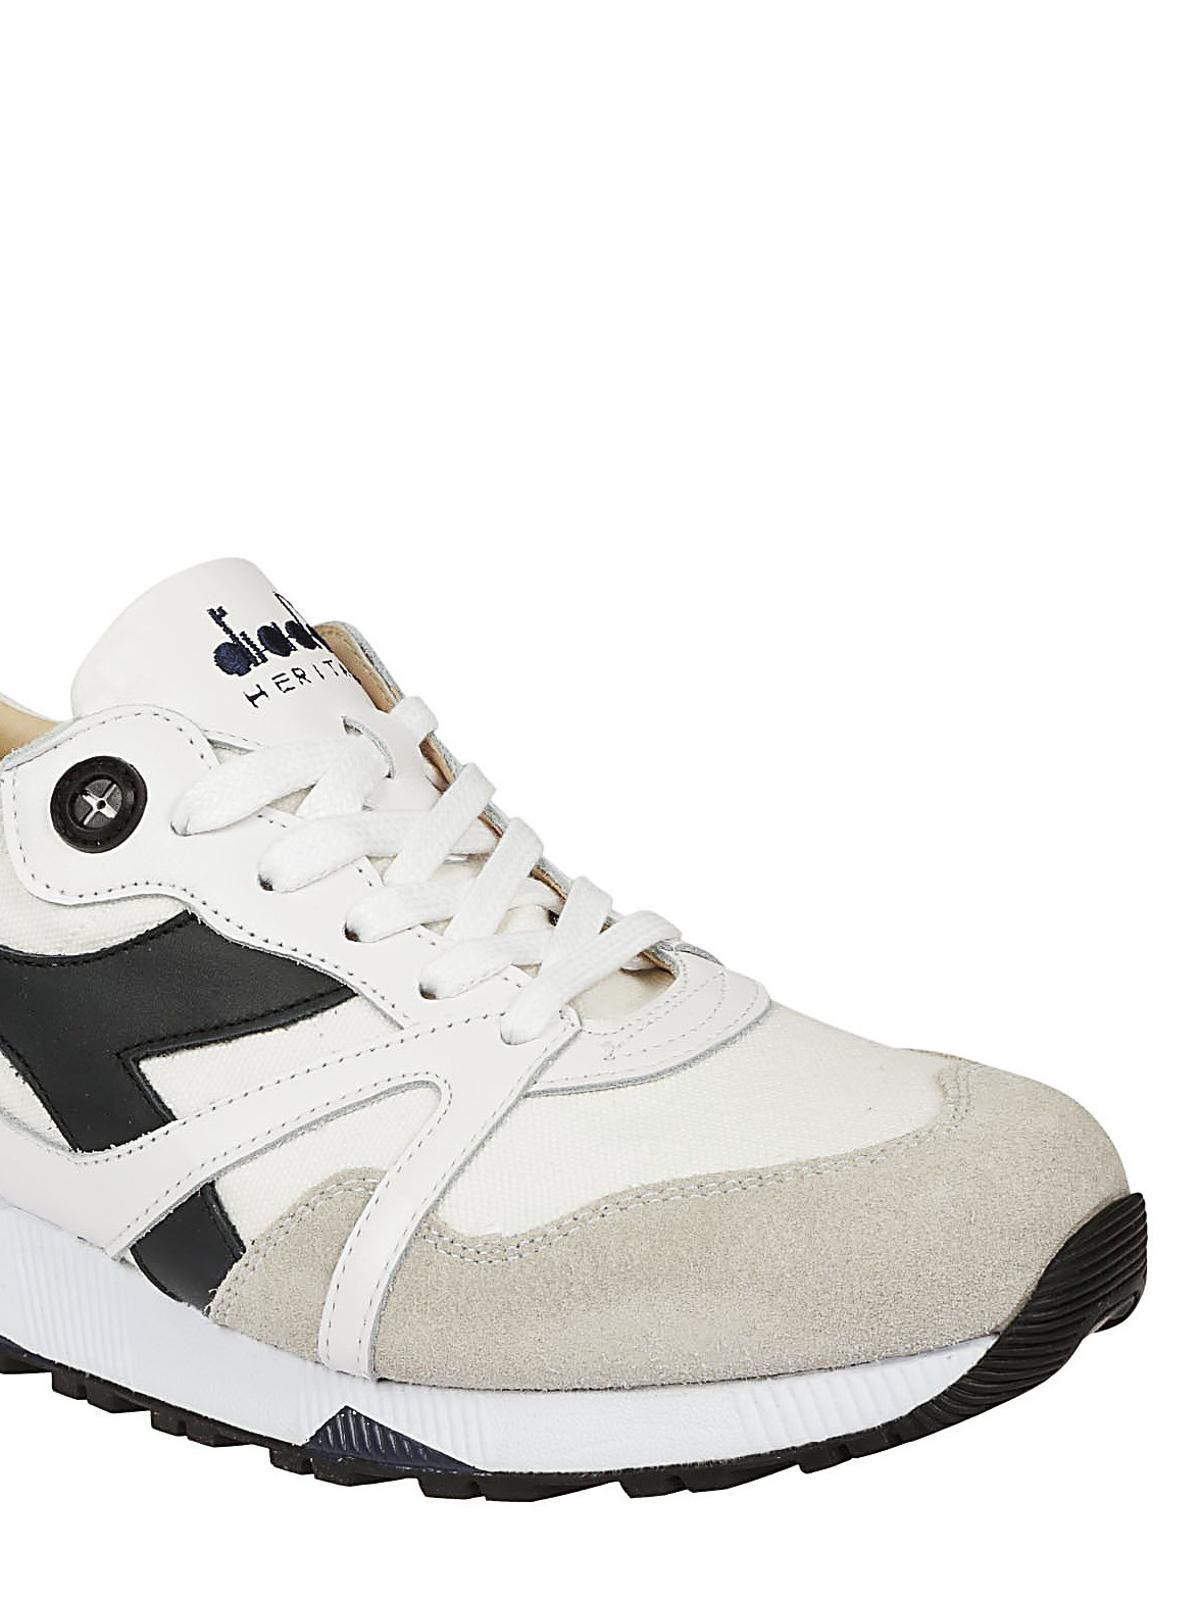 purchase cheap 51e53 8221b Diadora - Sneaker N9000 H Ita bianche - sneakers - 201172779 ...